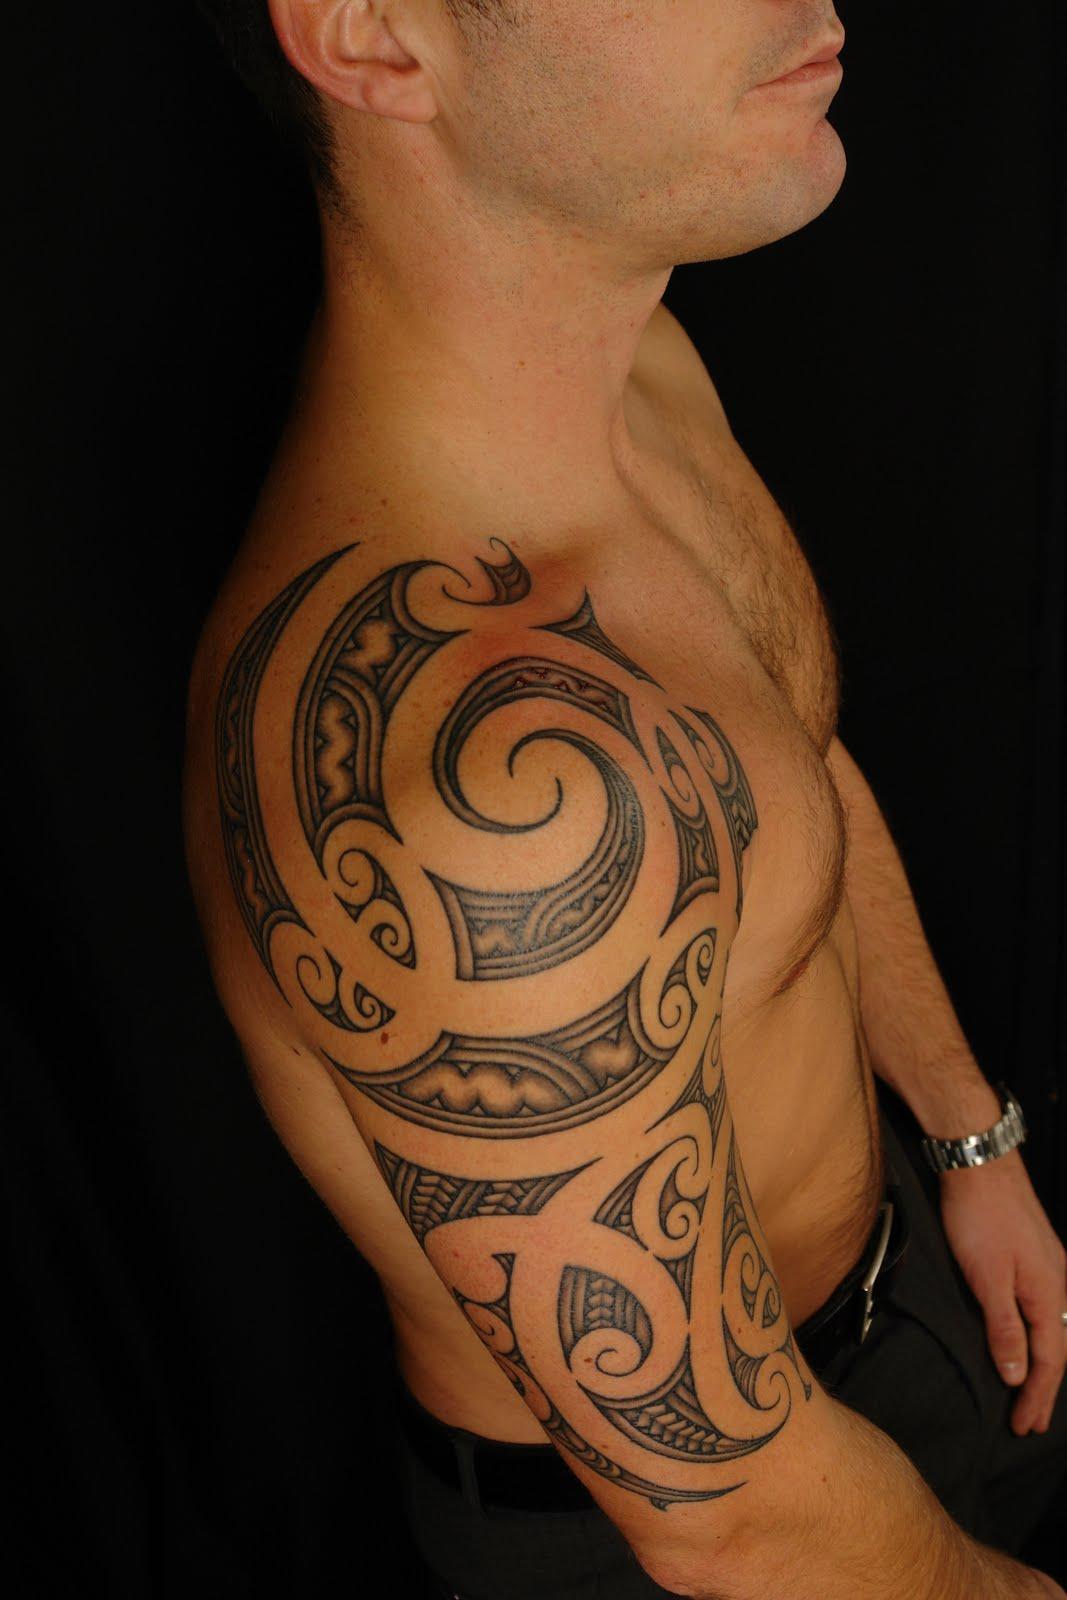 Body Art World Tattoos: Maori Tattoo Art And Traditional